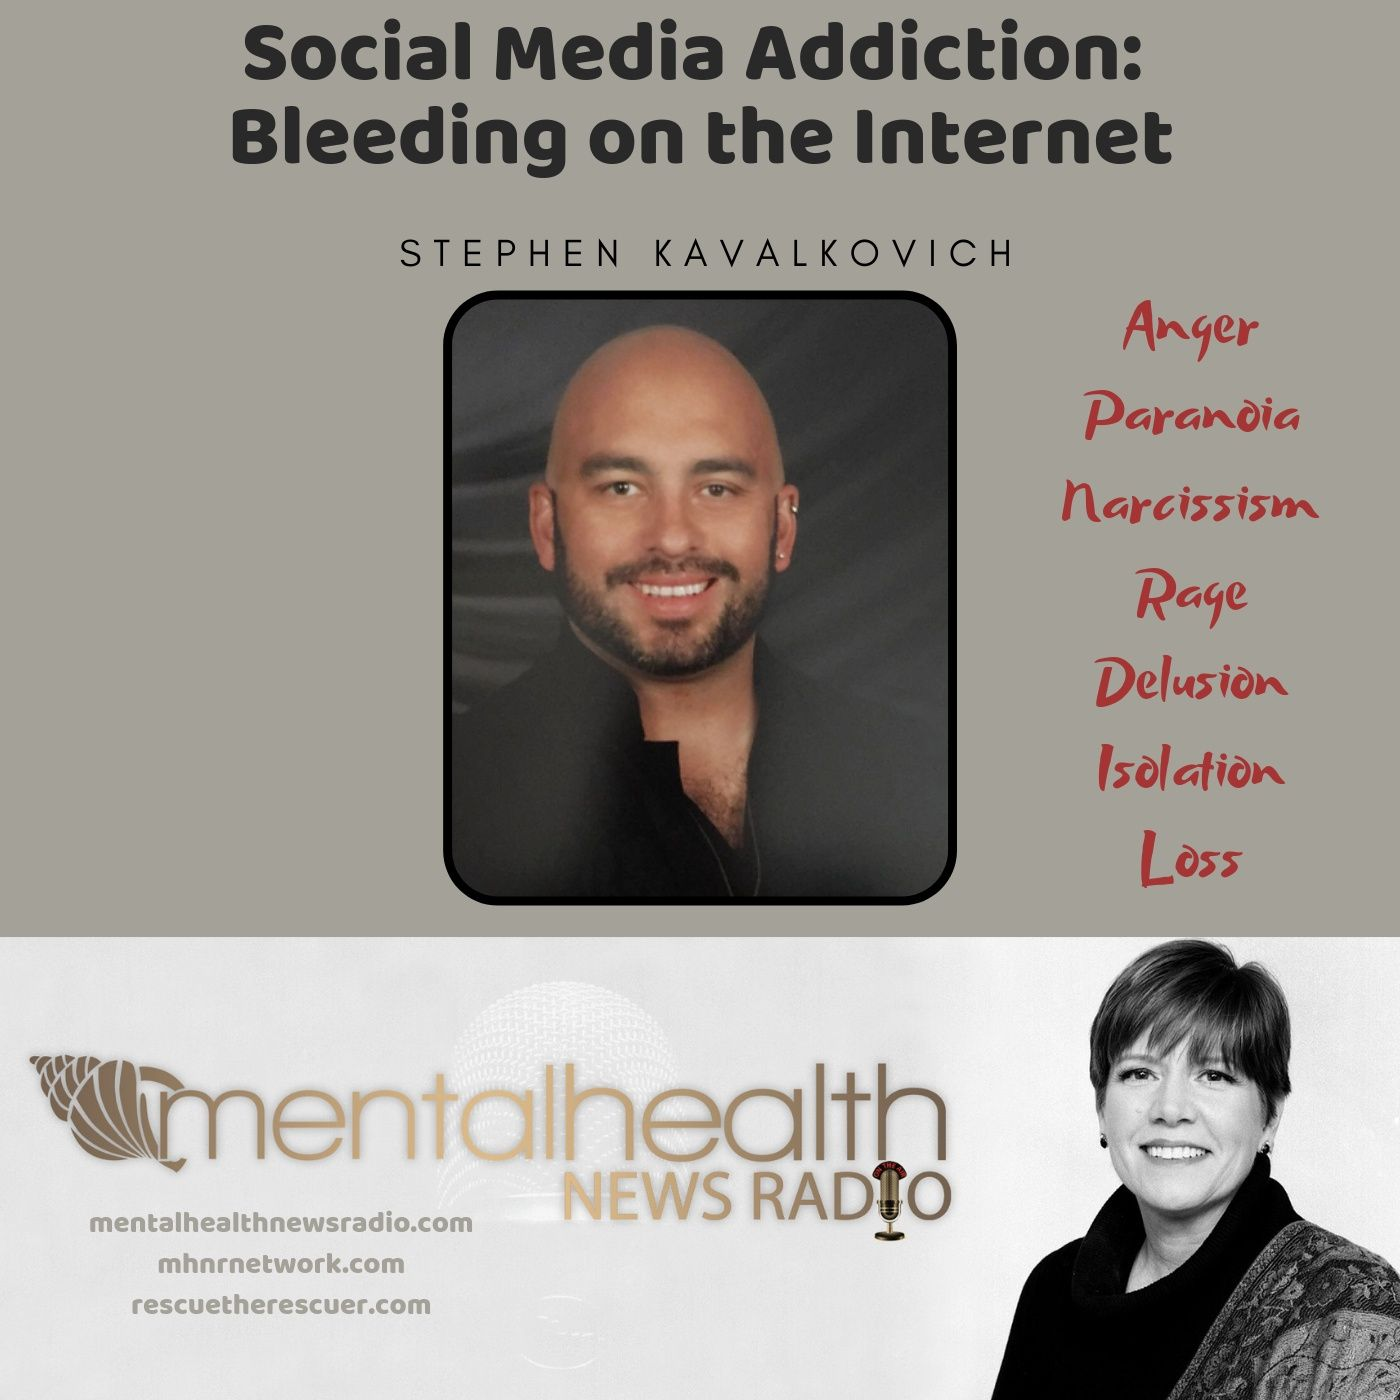 Mental Health News Radio - Social Media Addiction: Bleeding on the Internet